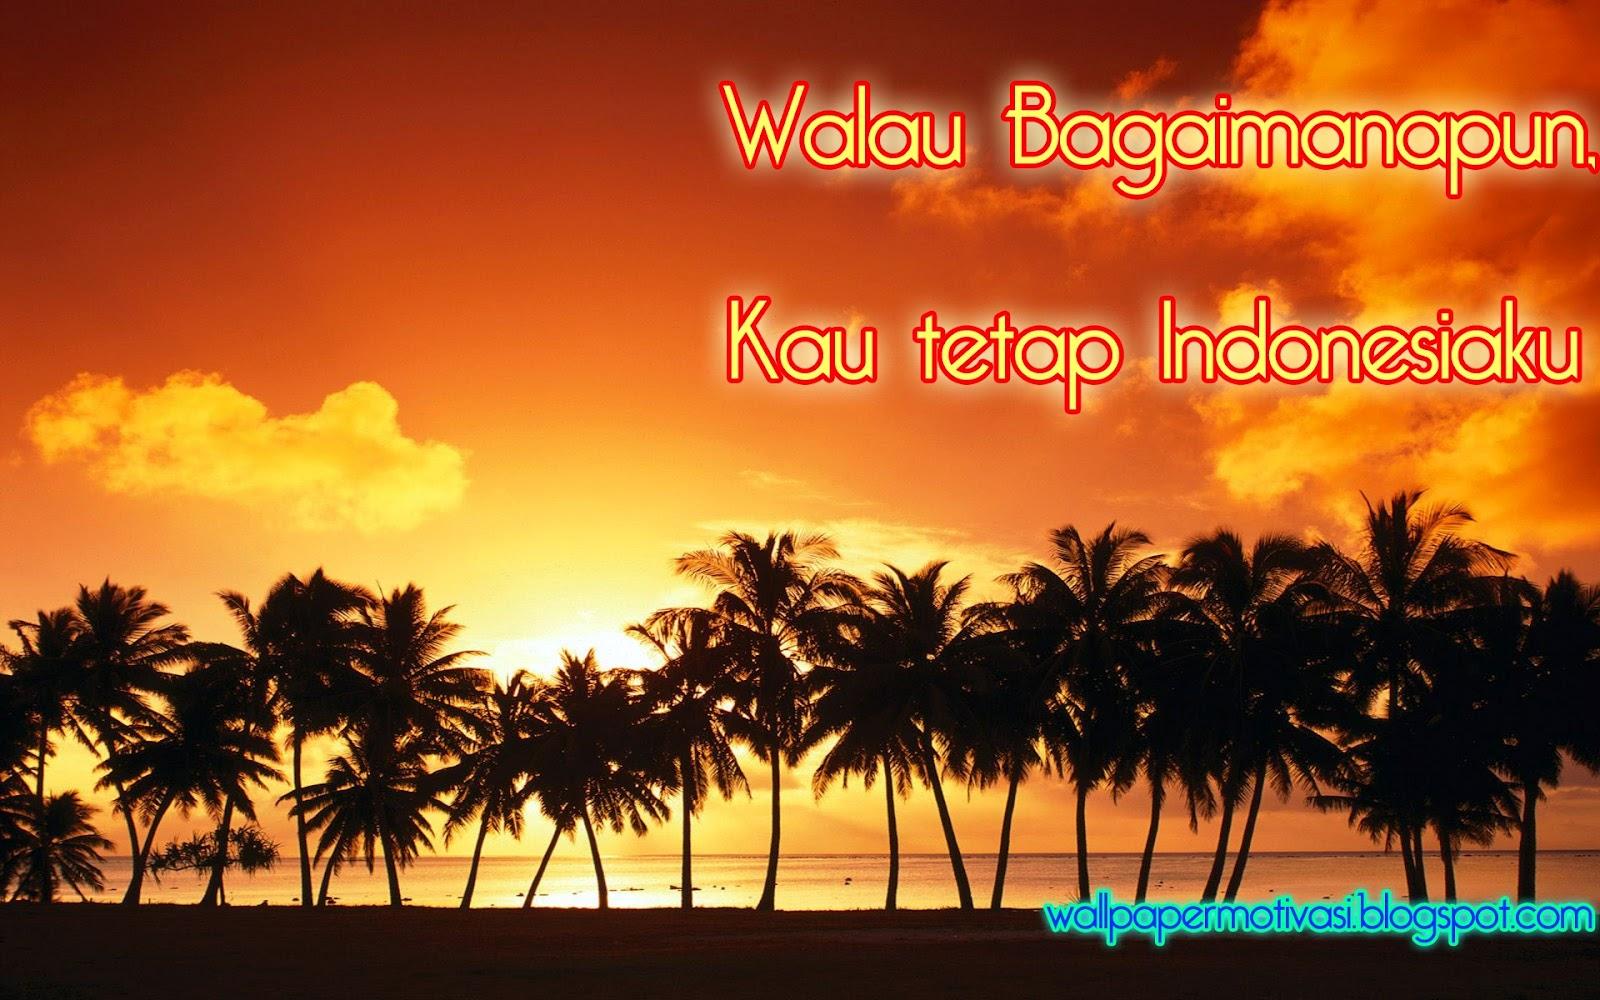 http://3.bp.blogspot.com/-KHZWSIwFM0c/UFB8yP85bTI/AAAAAAAAASU/PrwMsOtEY0g/s1600/kata+mutiara-kata+kata+bijak-kata+kata+indah-kau+tetap+indonesiaku.jpg